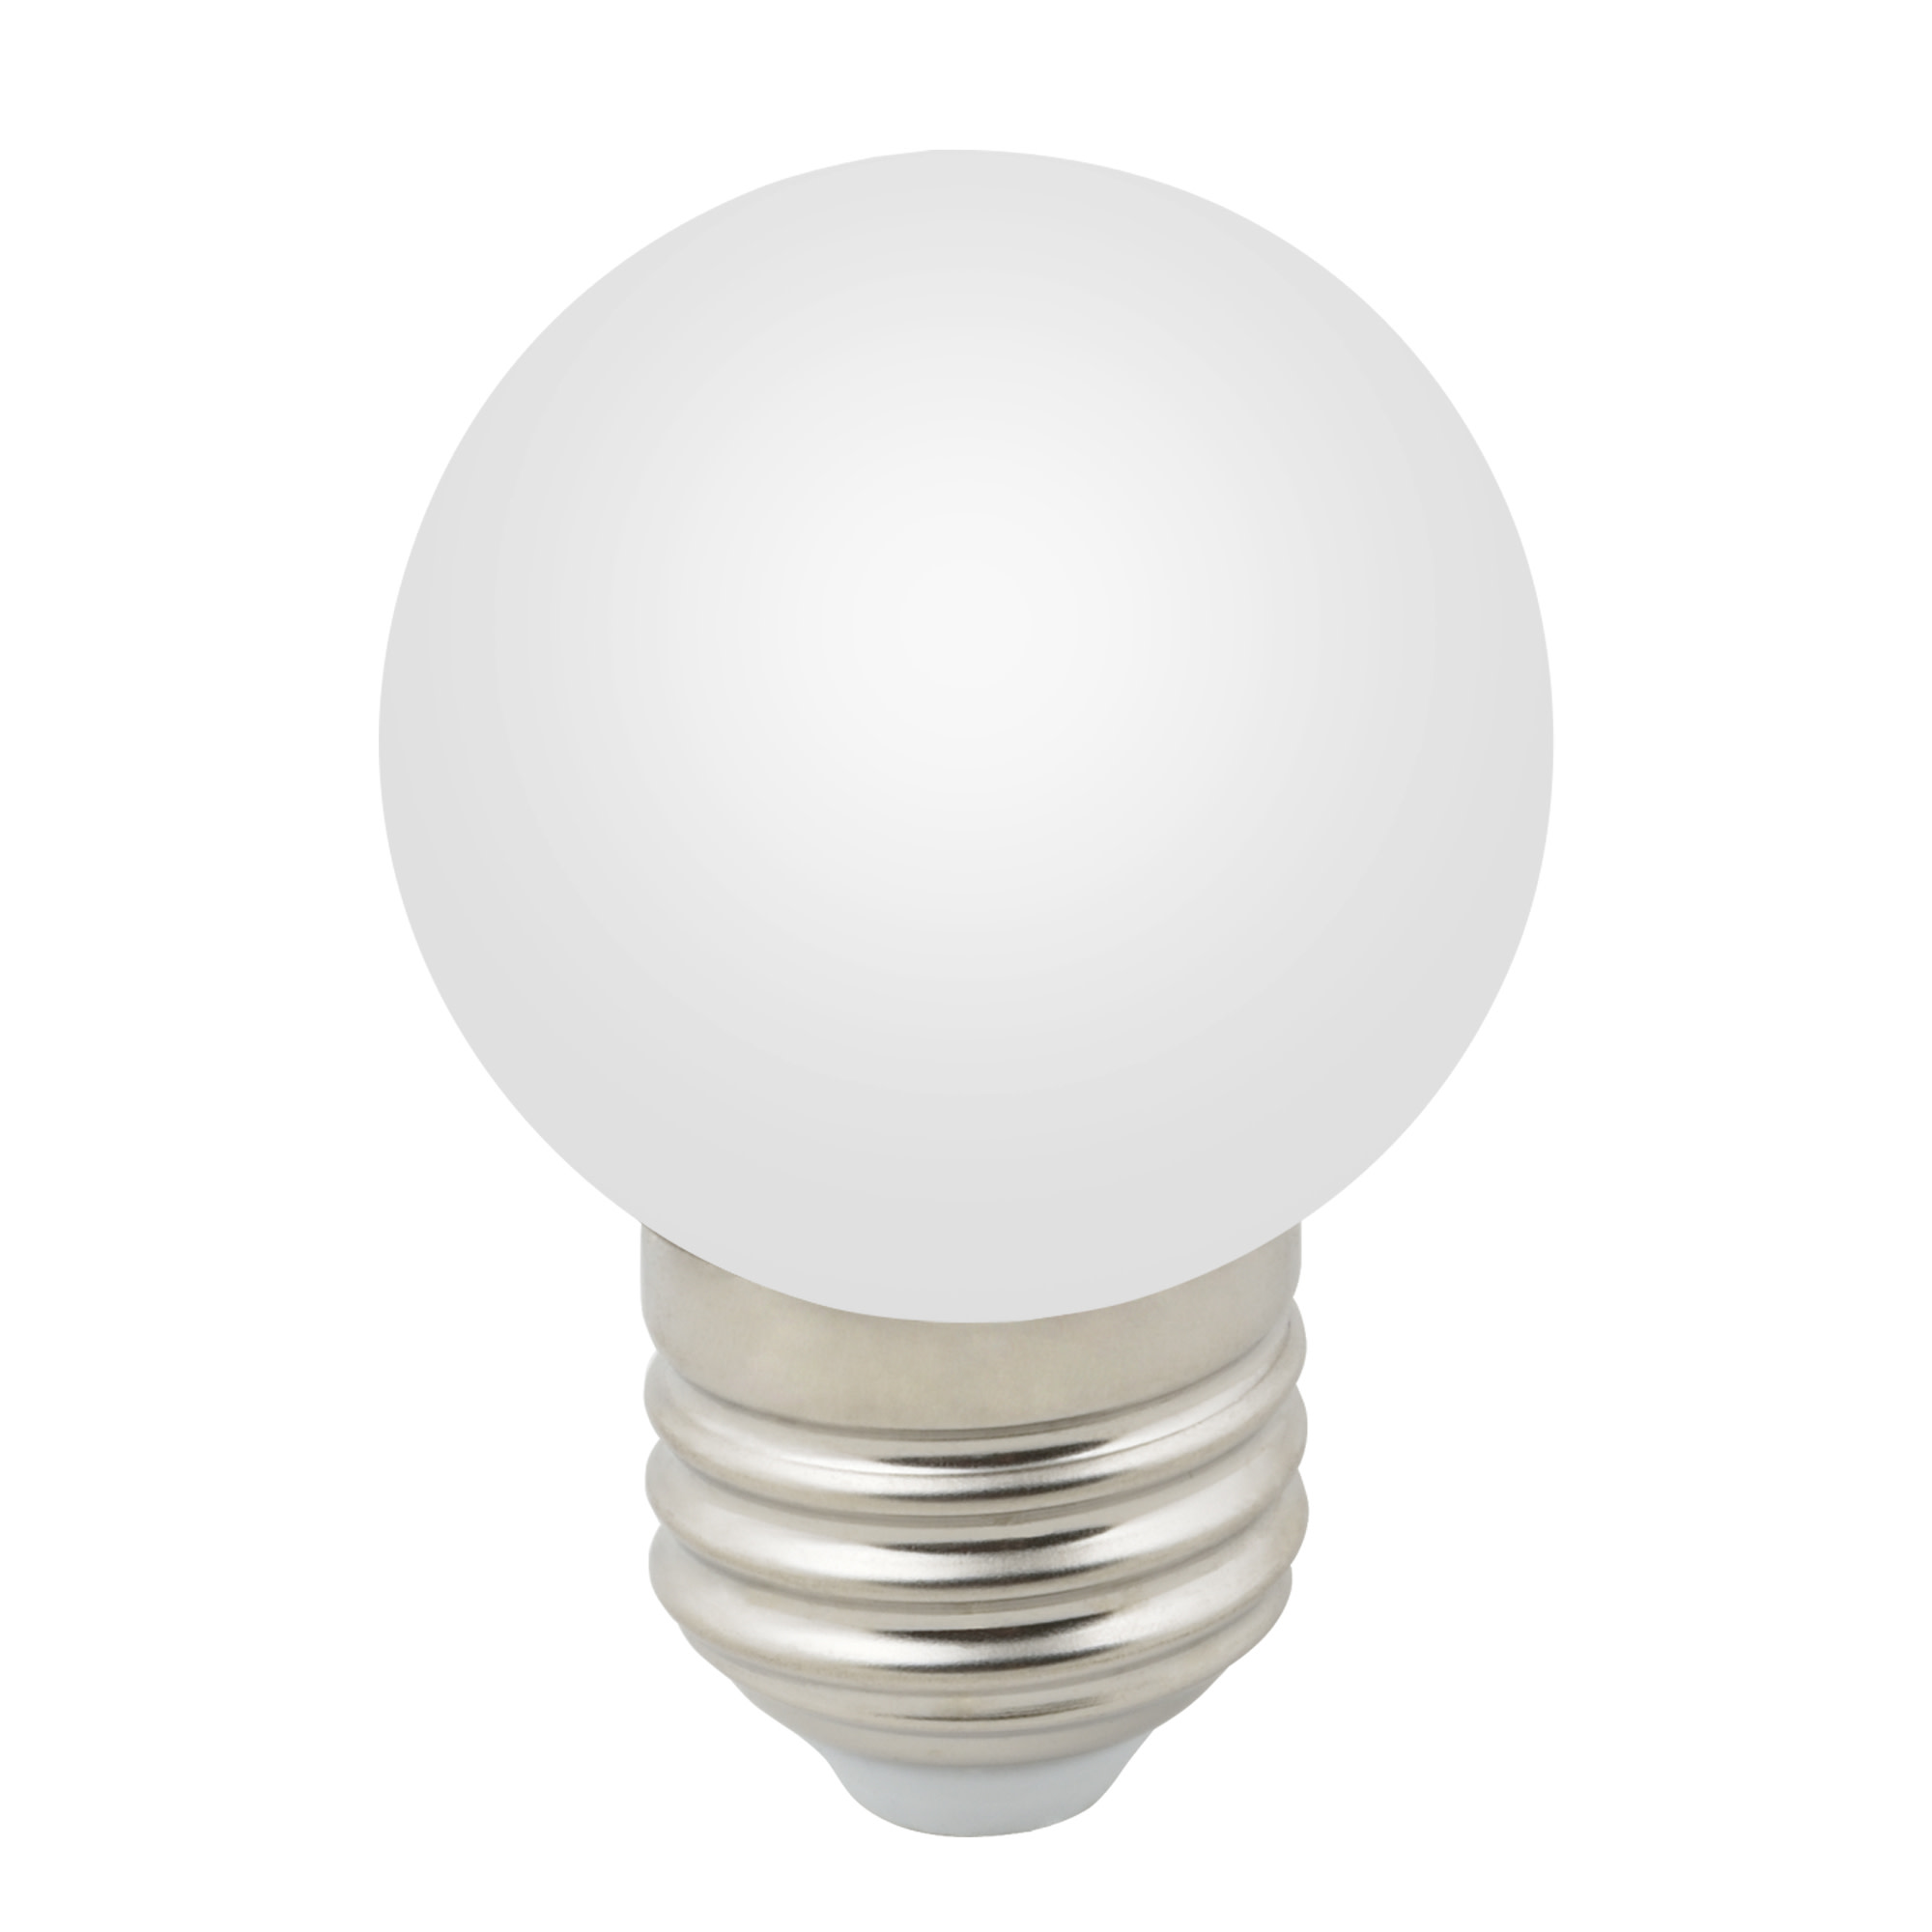 Лампа светодиодная E27 12/220 1 Вт шар матовая 80 лм теплый белый свет